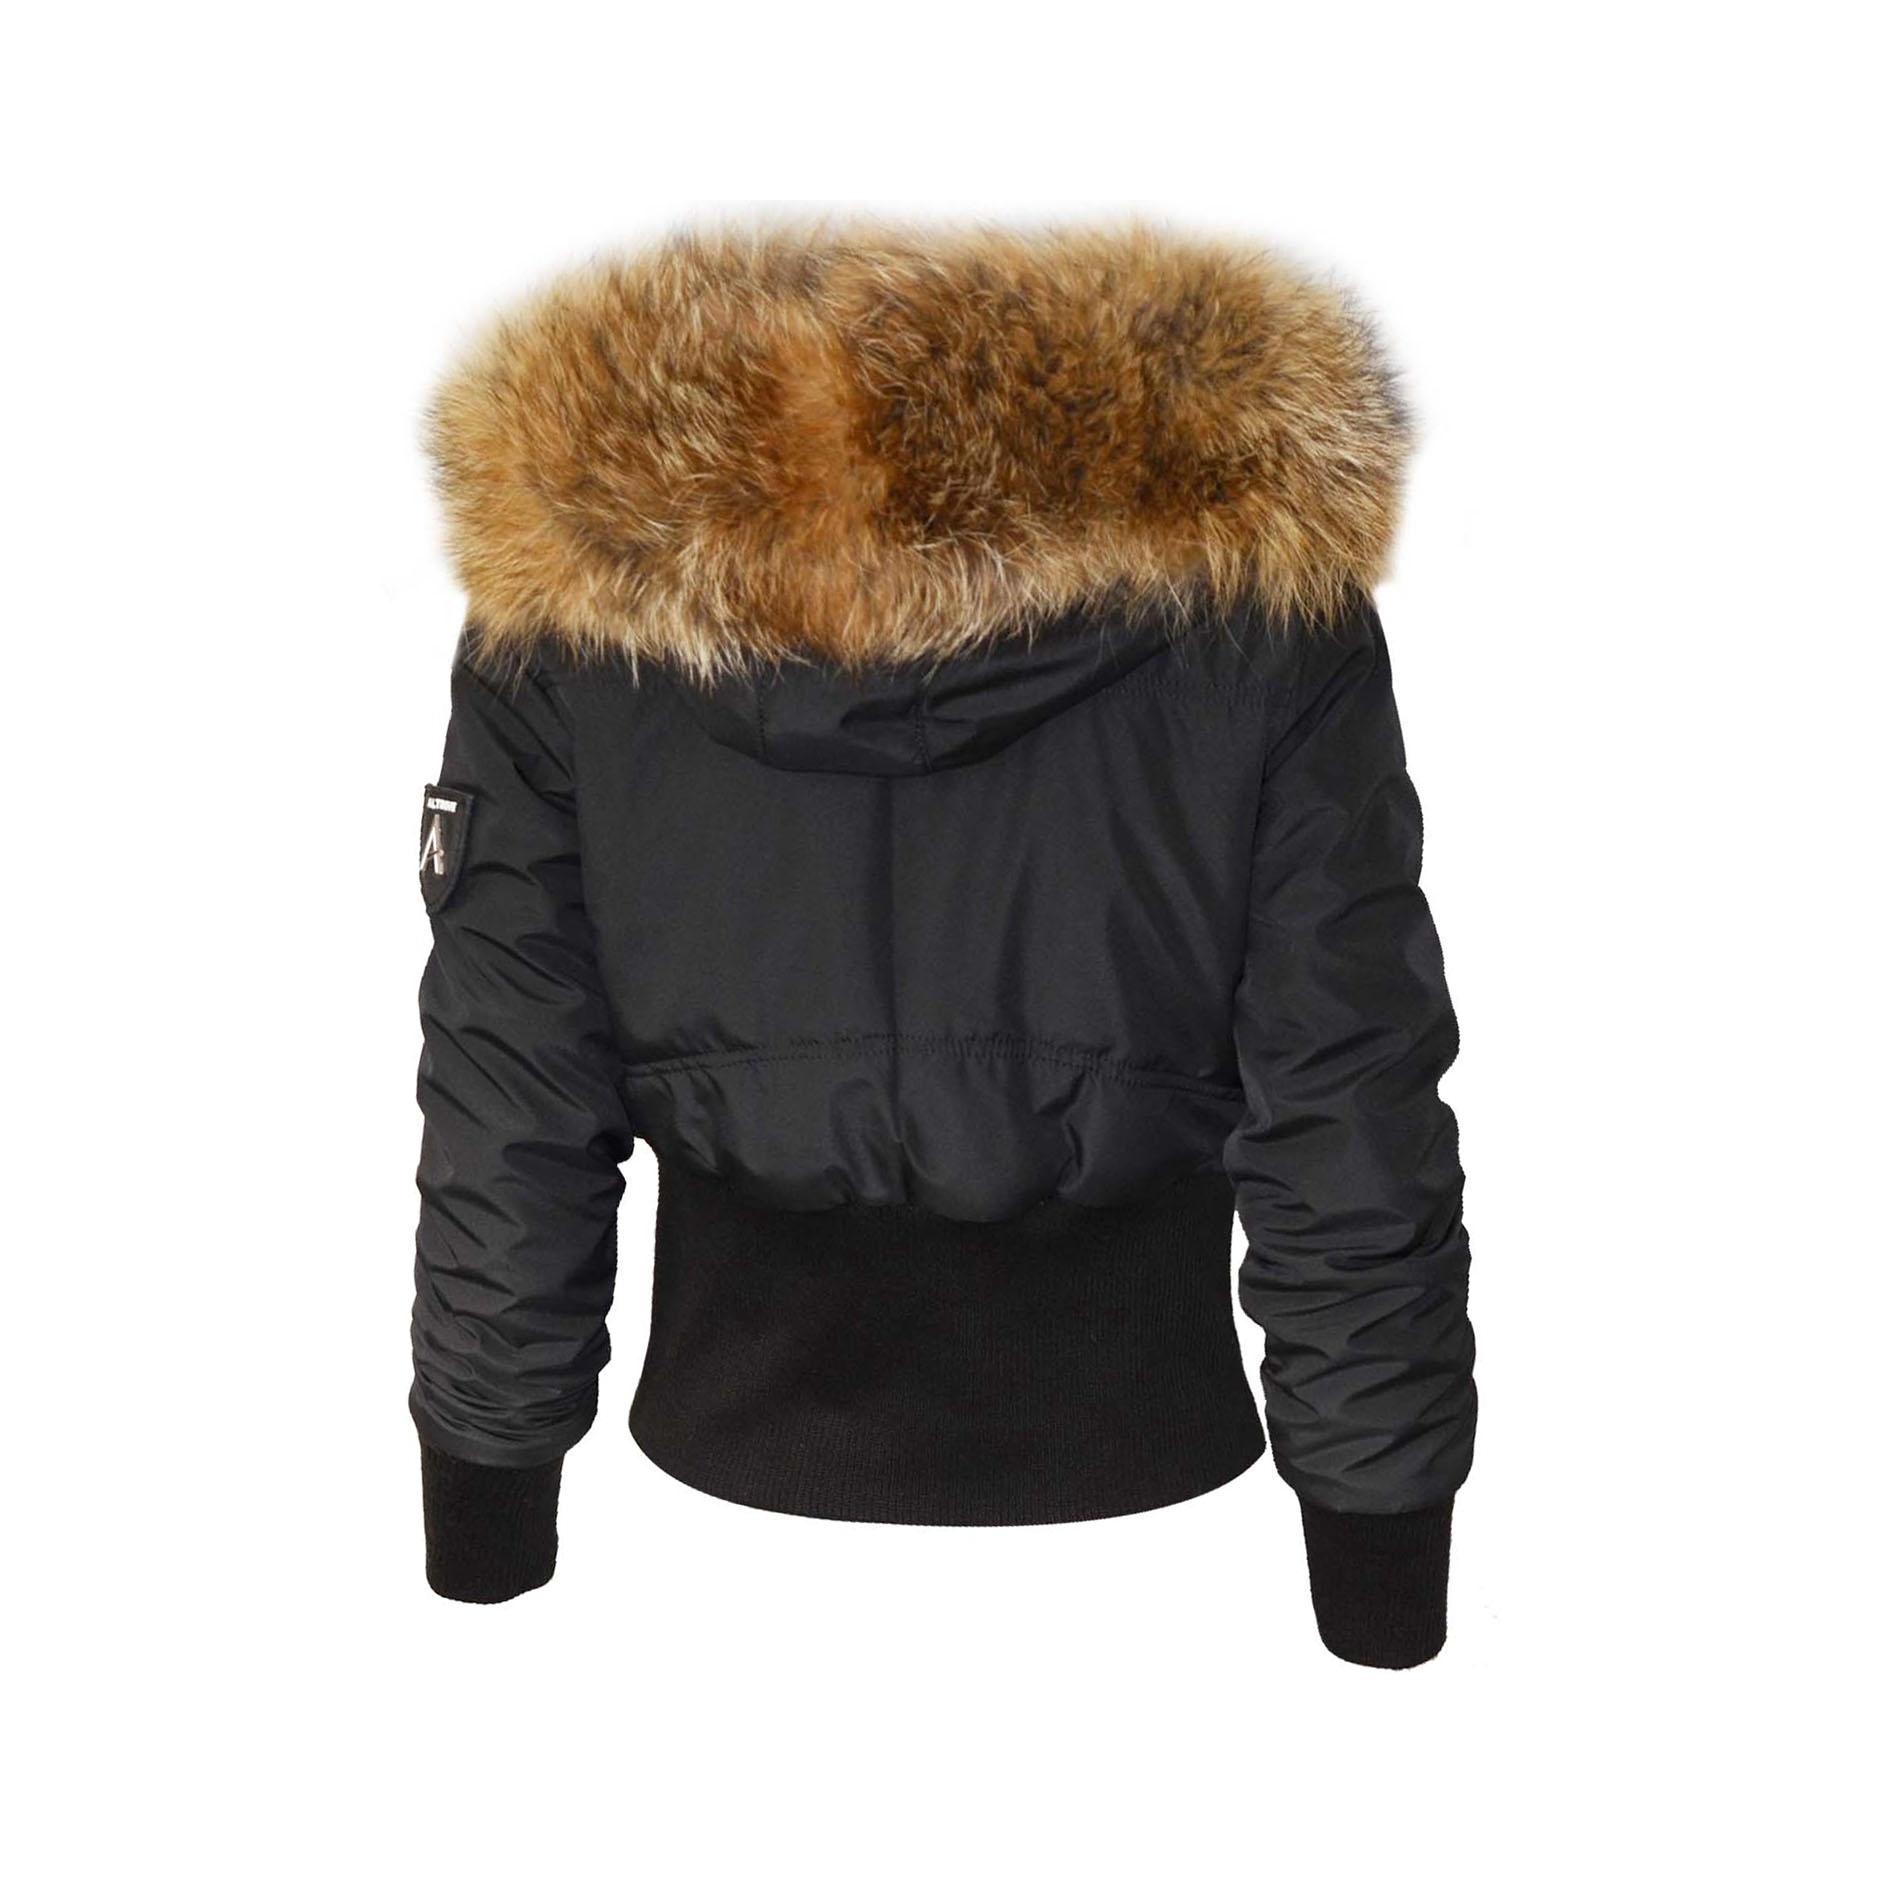 altrov veste tina doudoune hiver femme fourrure v ritable ceinture cintr collection hiver. Black Bedroom Furniture Sets. Home Design Ideas